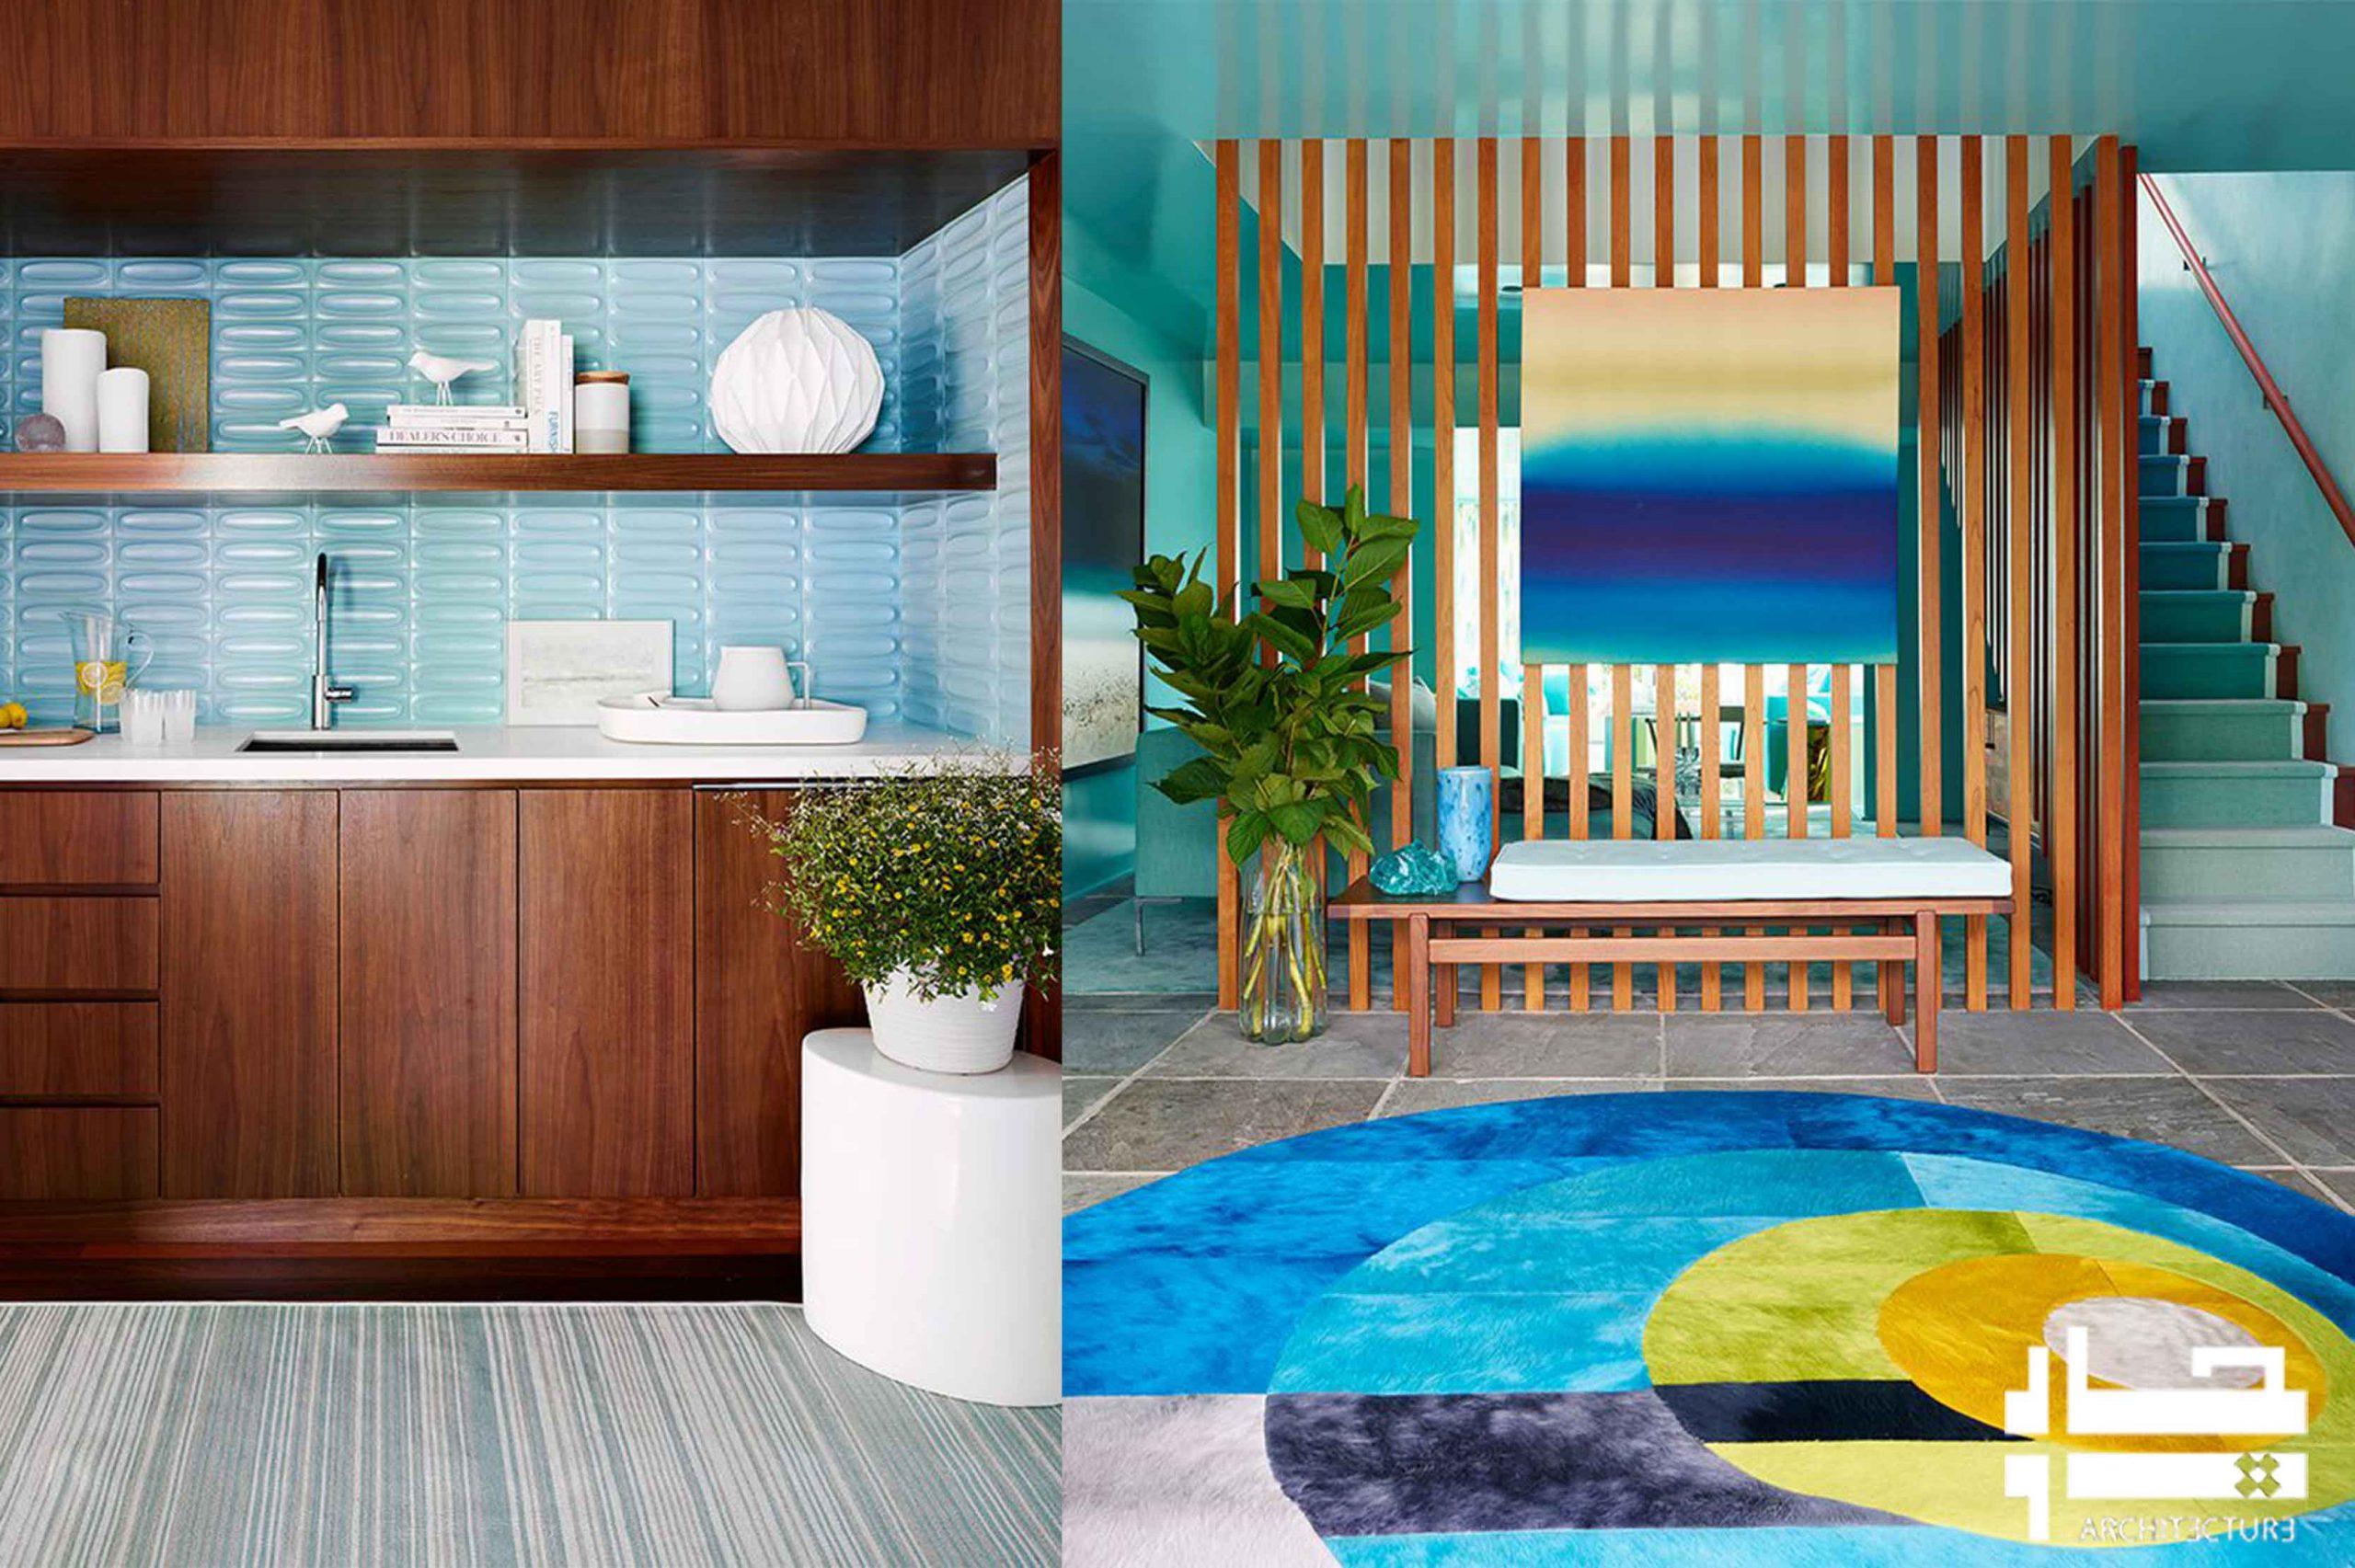 خانه تابستانی همپتونس